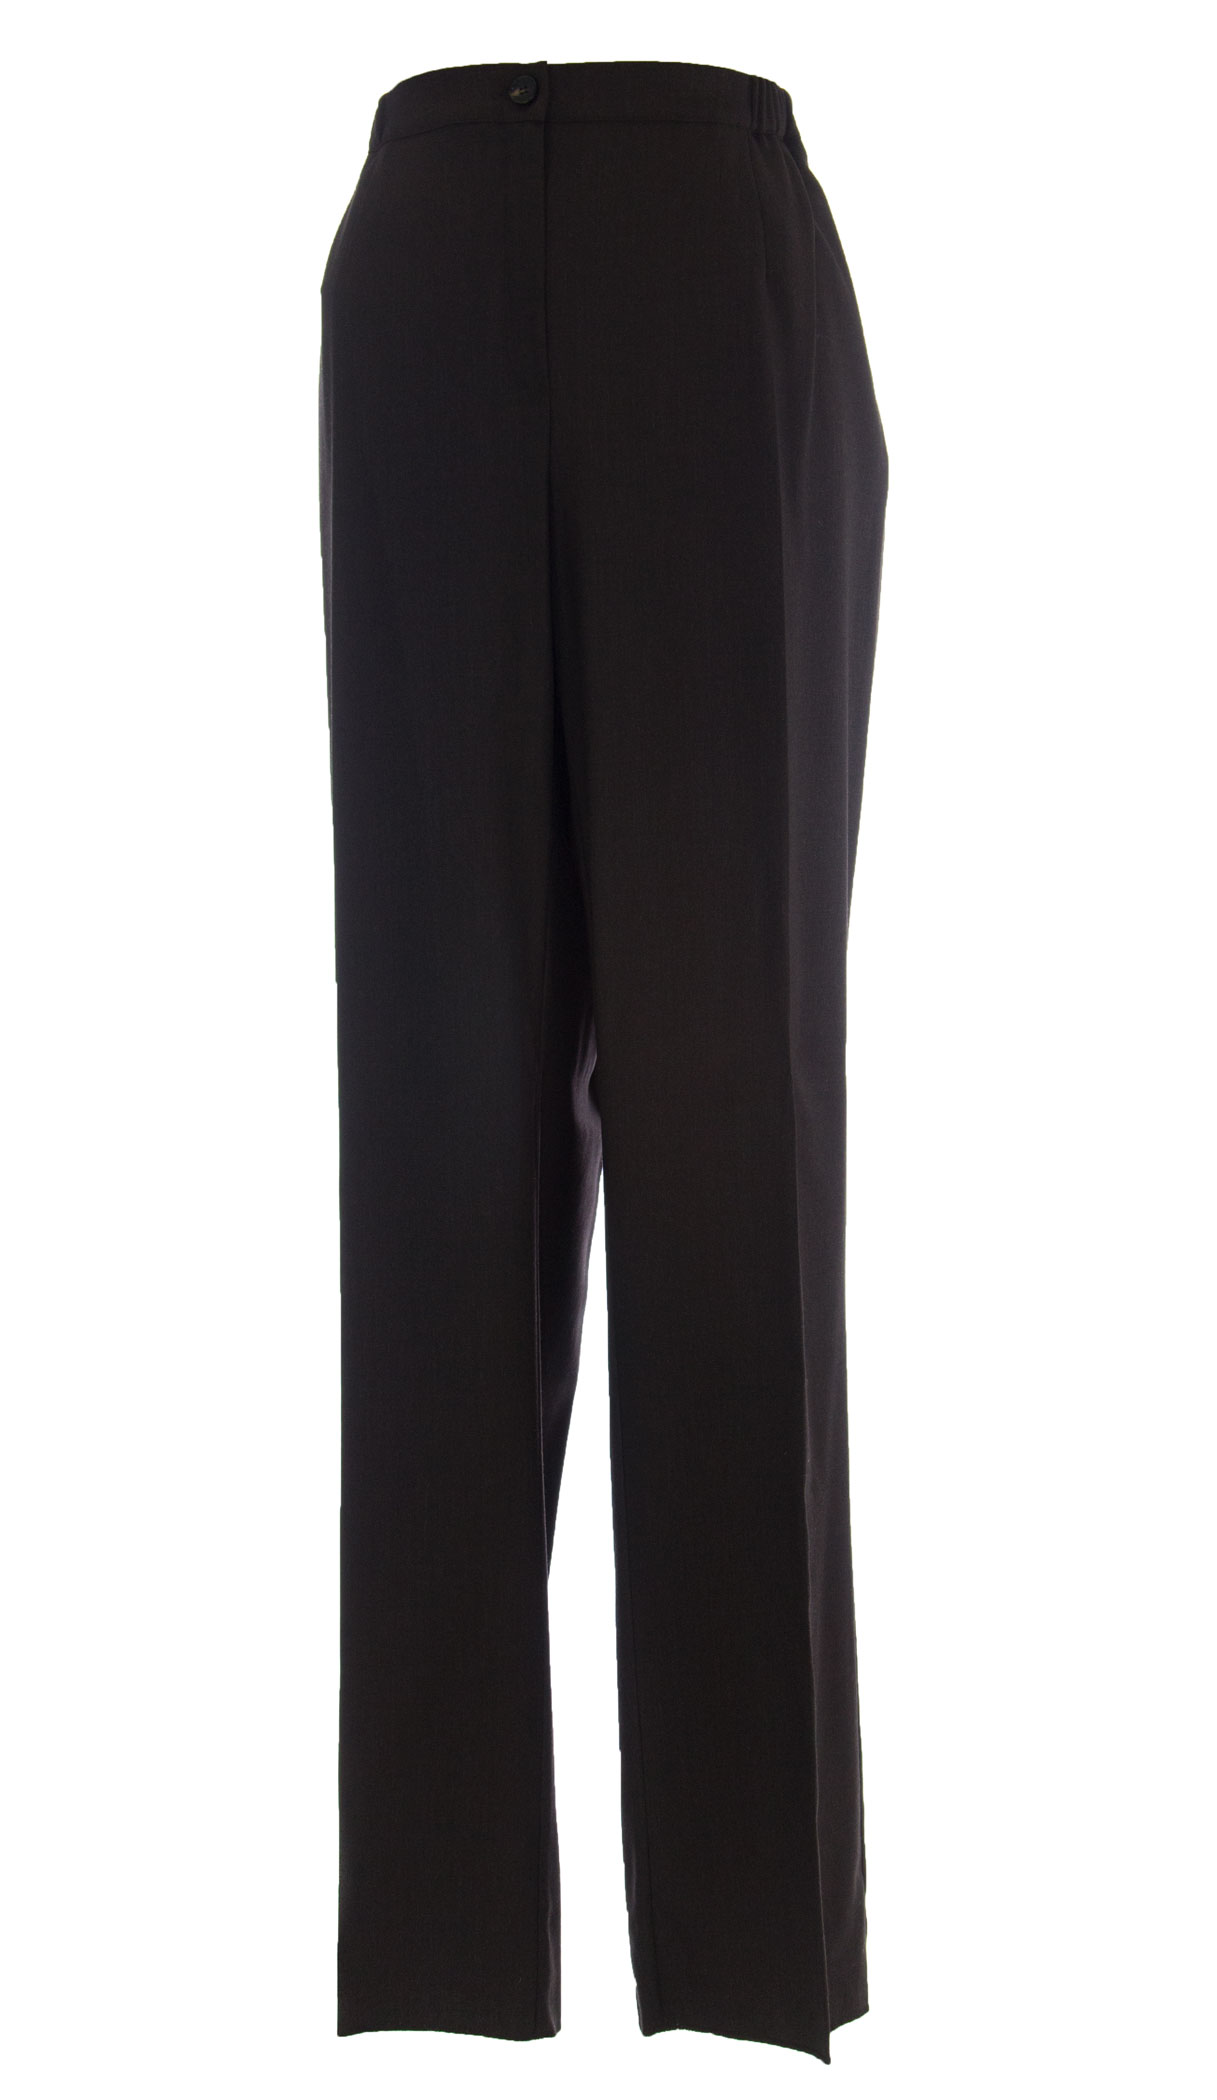 MARINA RINALDI by MaxMara Barghe Dark Brown Unhemmed Dress Pants  22W   31